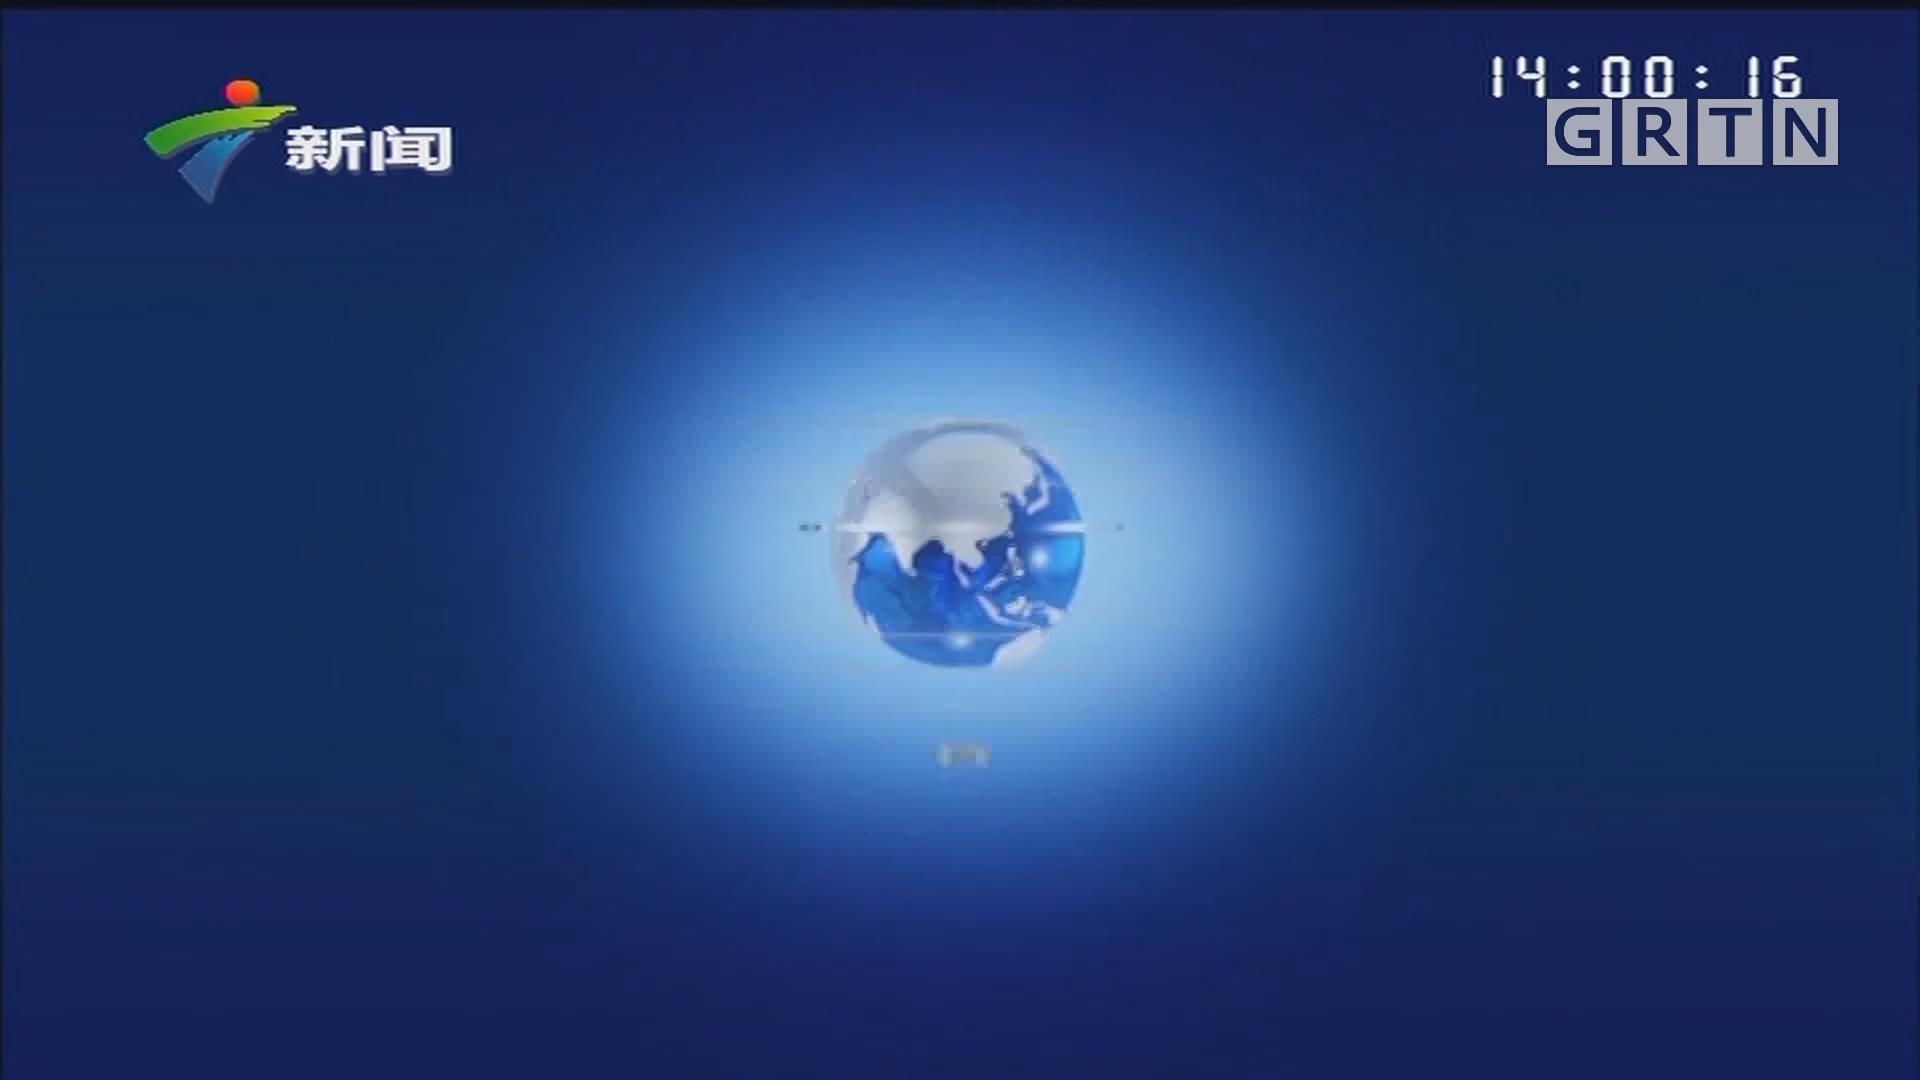 [HD][2019-11-15]正點播報:世界臍血日 專家呼吁保護臍血資源幫助更多有需要的人